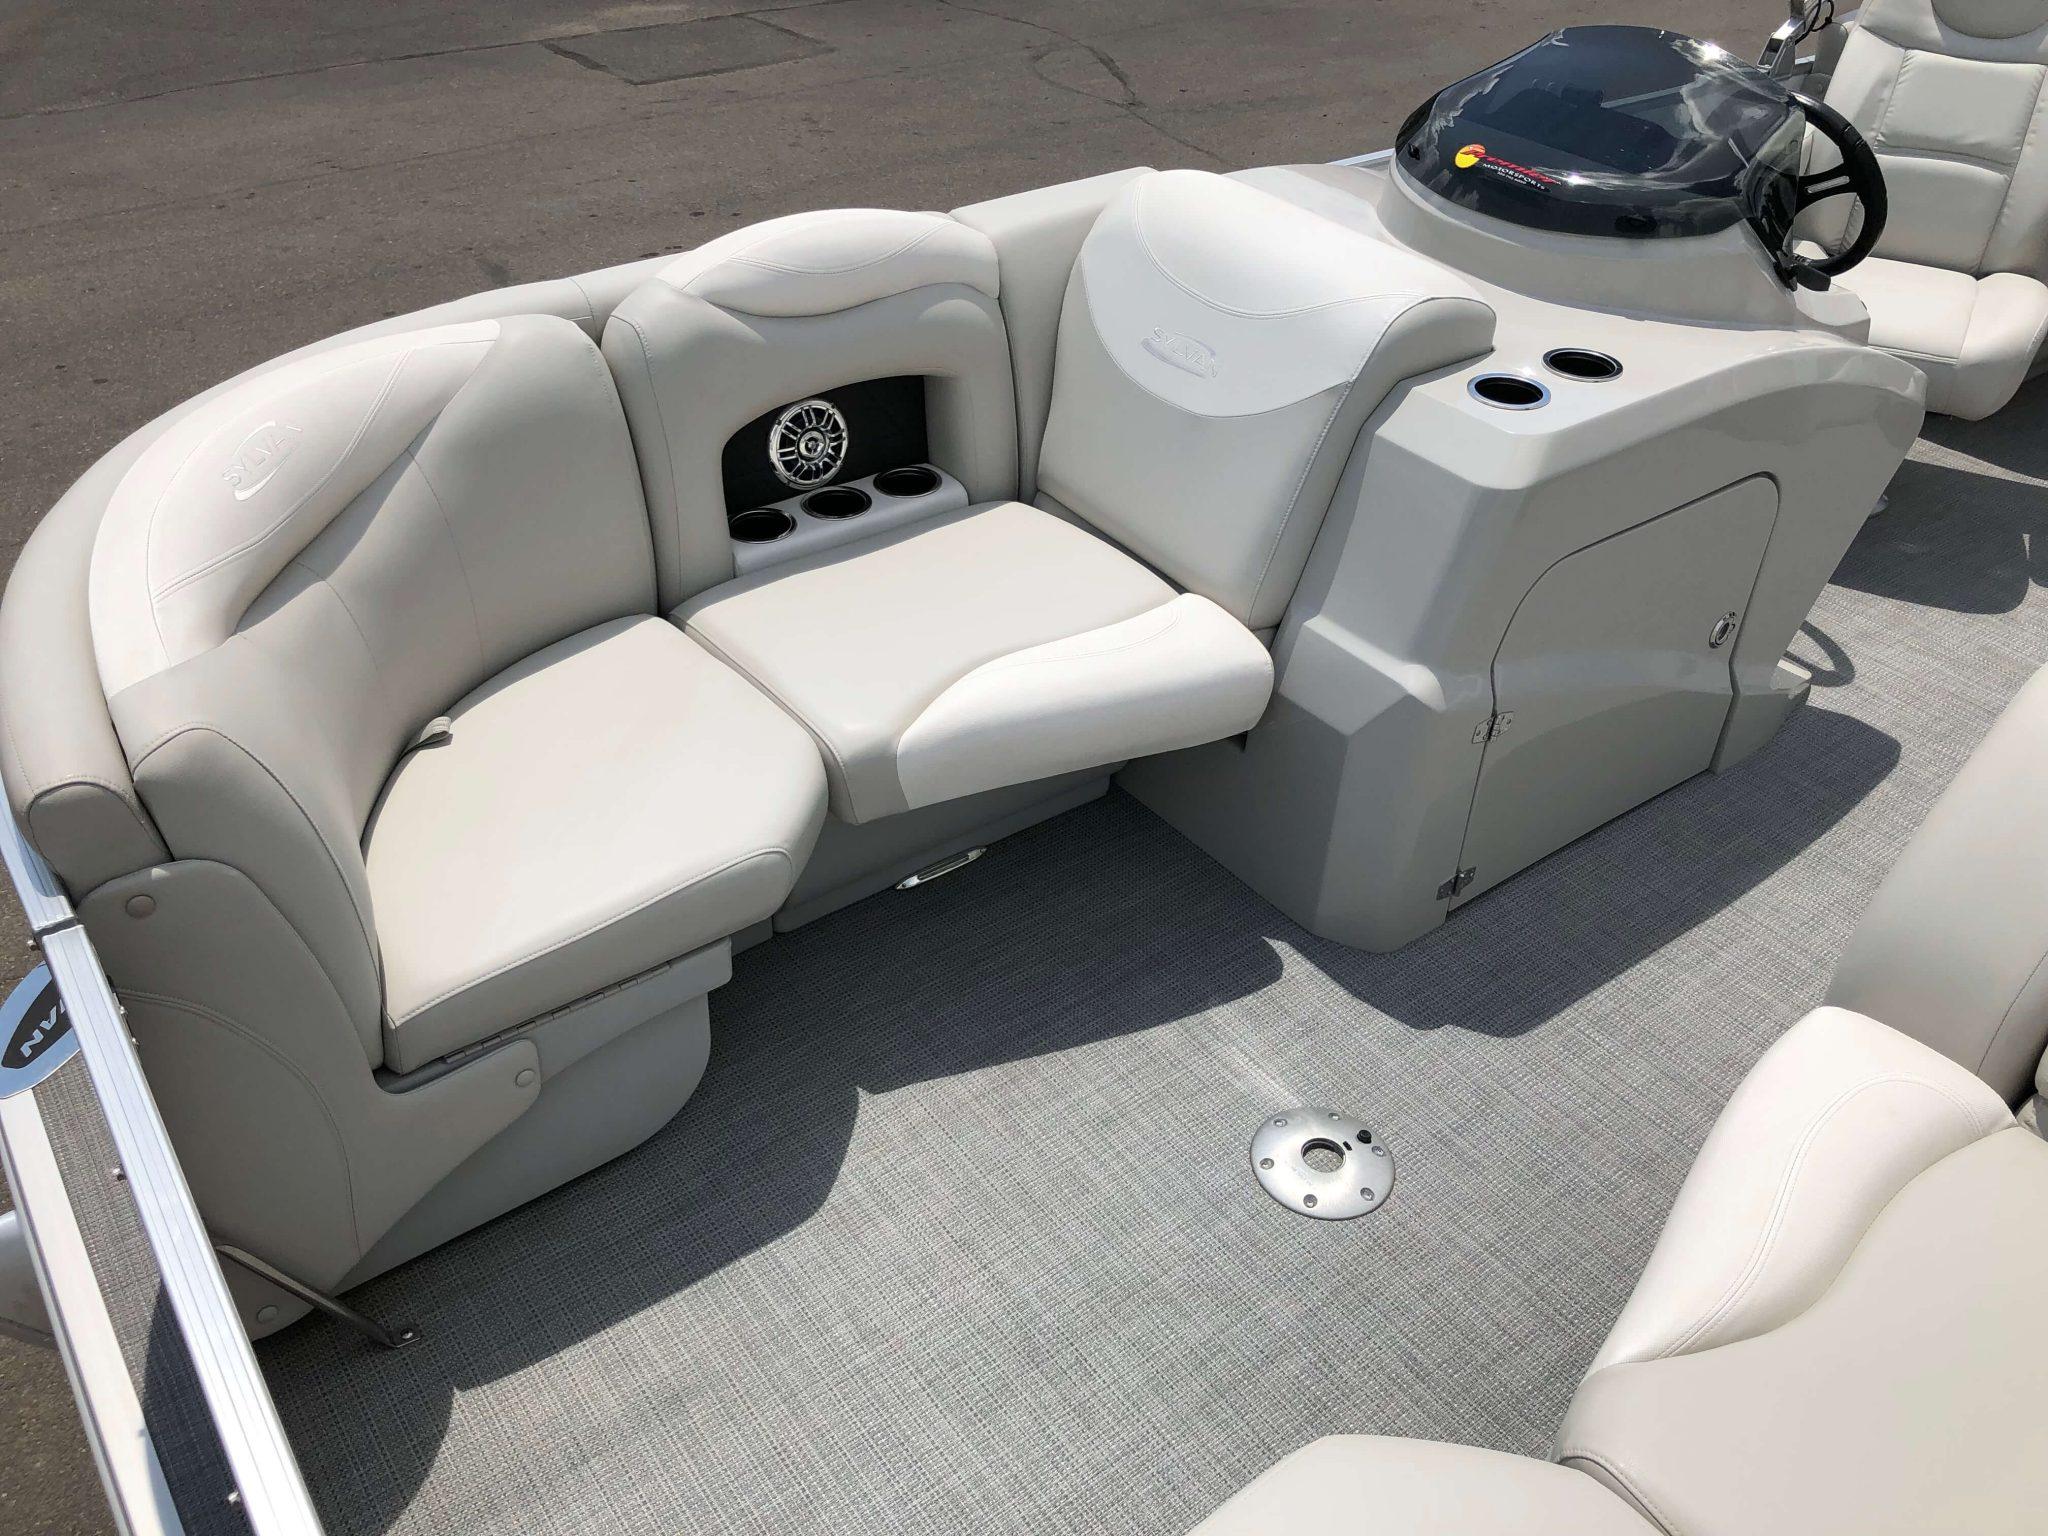 2016 Sylvan 8520 LZ LES Pontoon Boat Seating 3